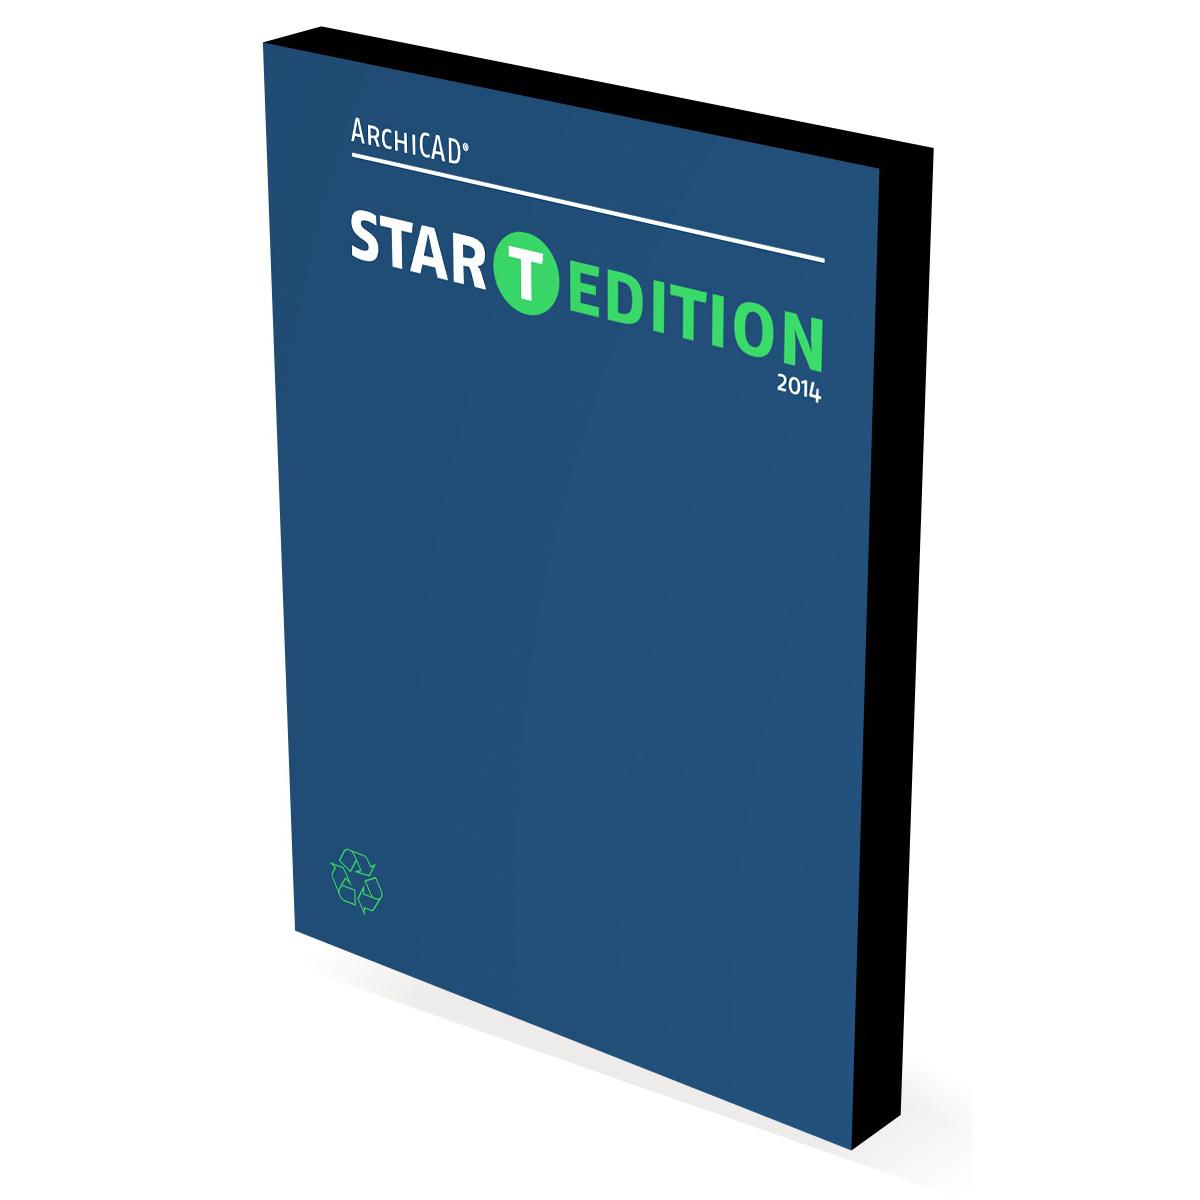 ArchiCAD Star(t) EDITION 2015   rice: 1500€